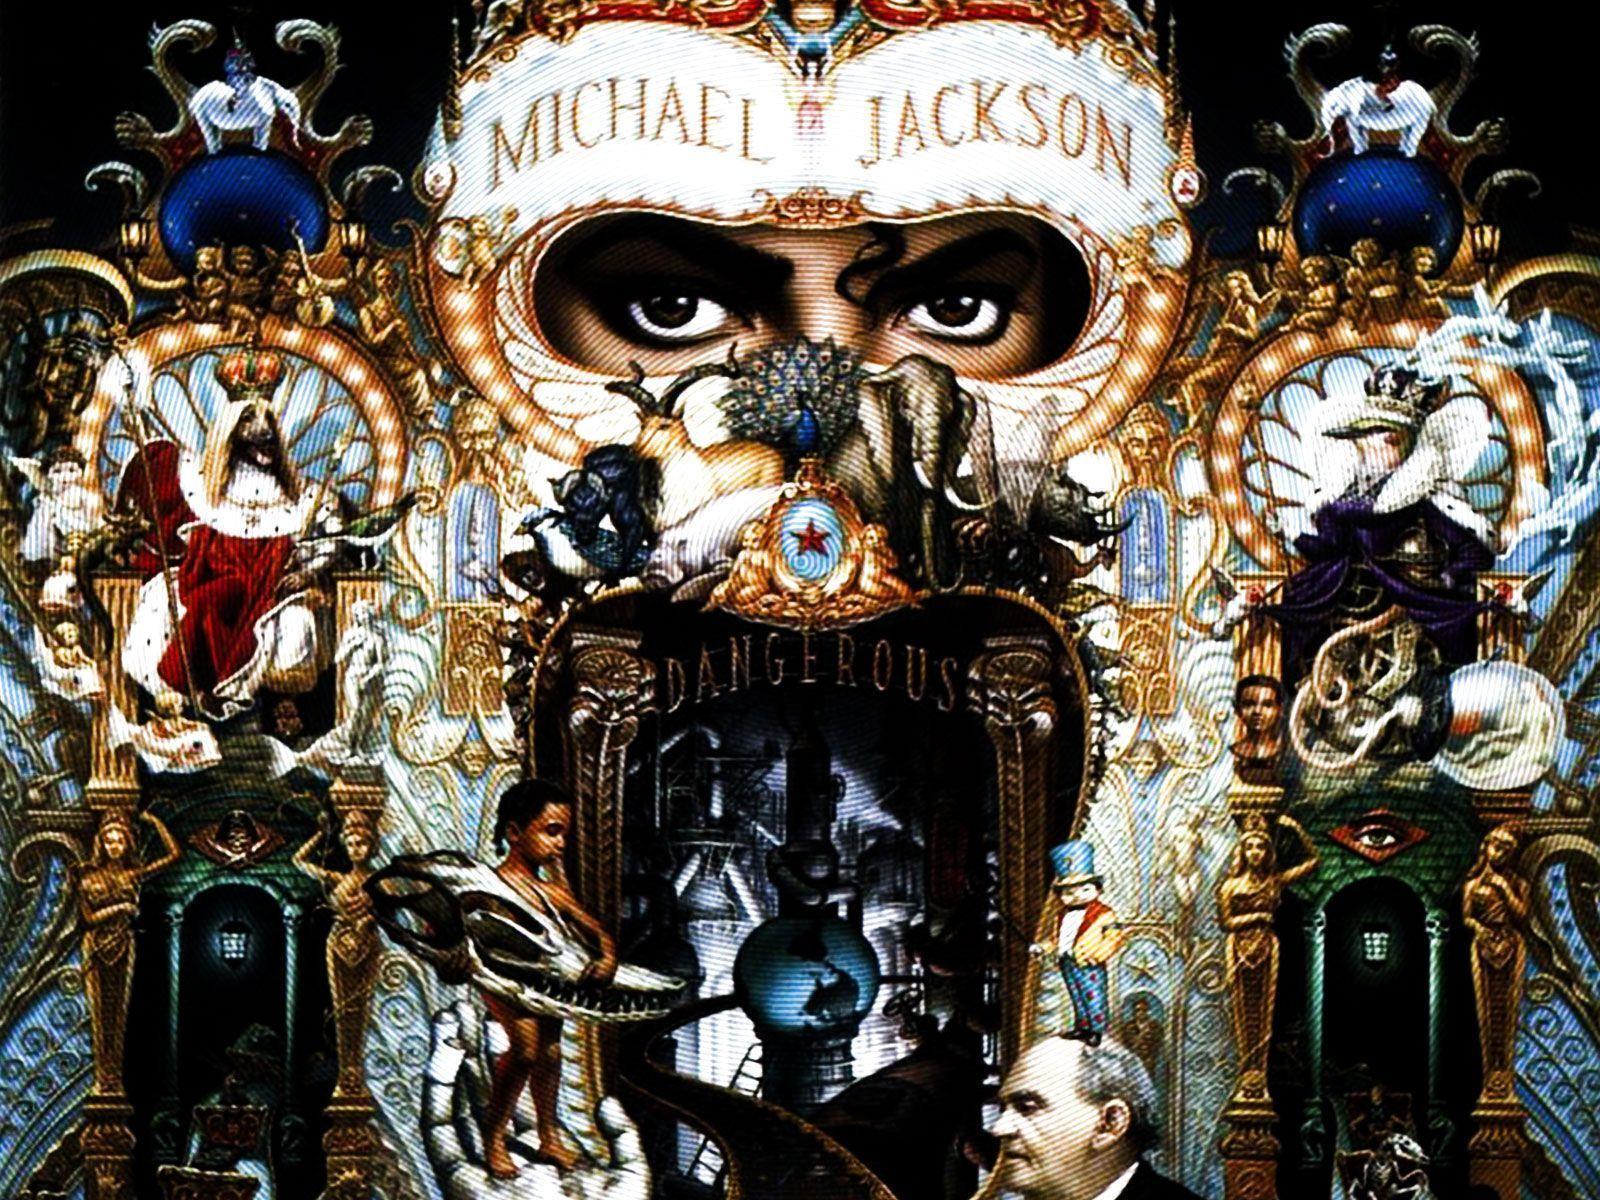 Michael Jackson Dangerous Wallpaper Hd Desktop 10 HD Wallpapers ...